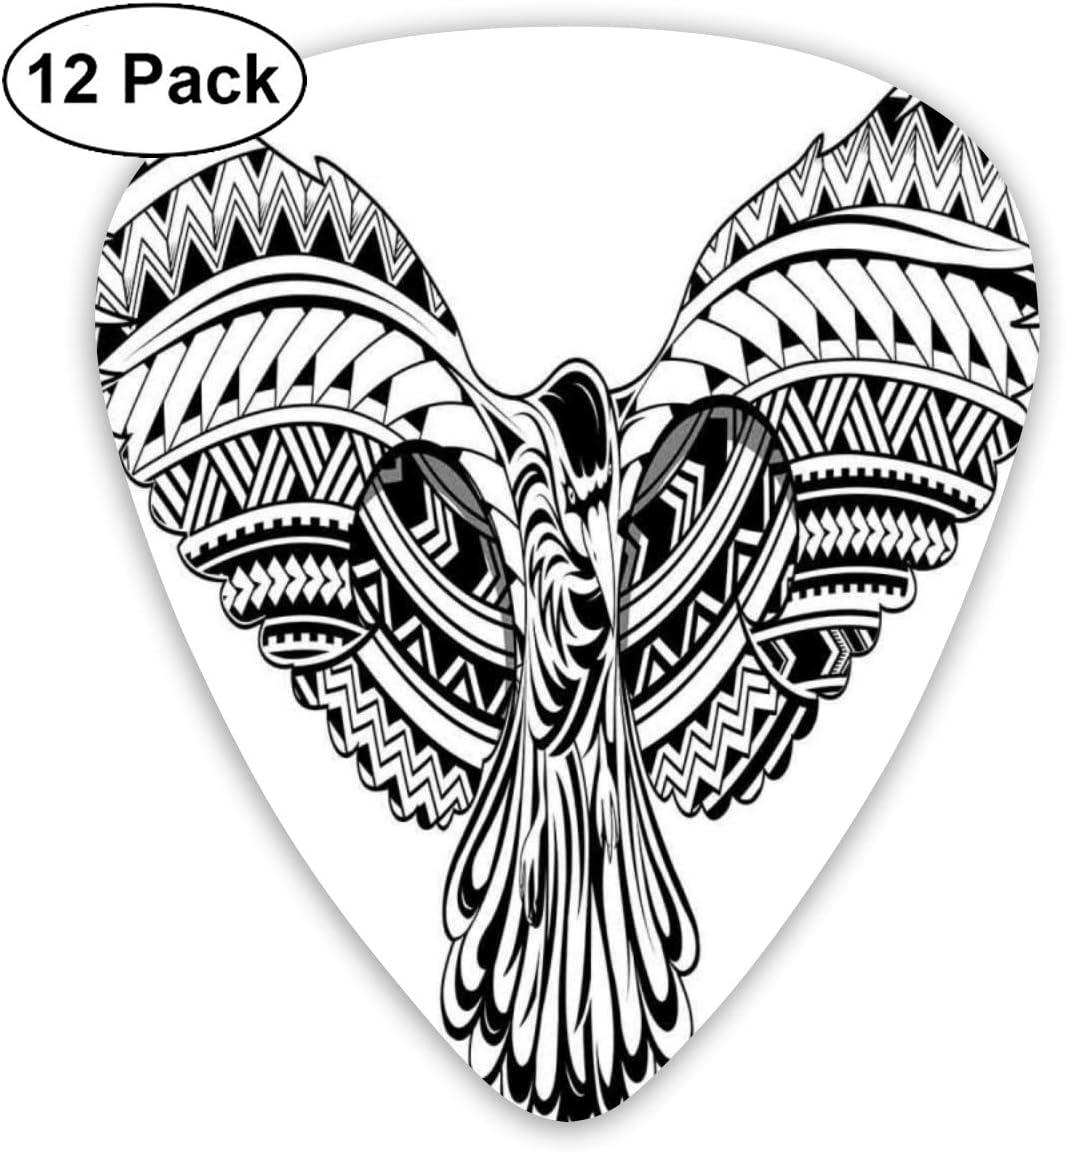 Guitar Picks 12-Pack,Crow Bird Tattoo Artwork With Maori Style ...